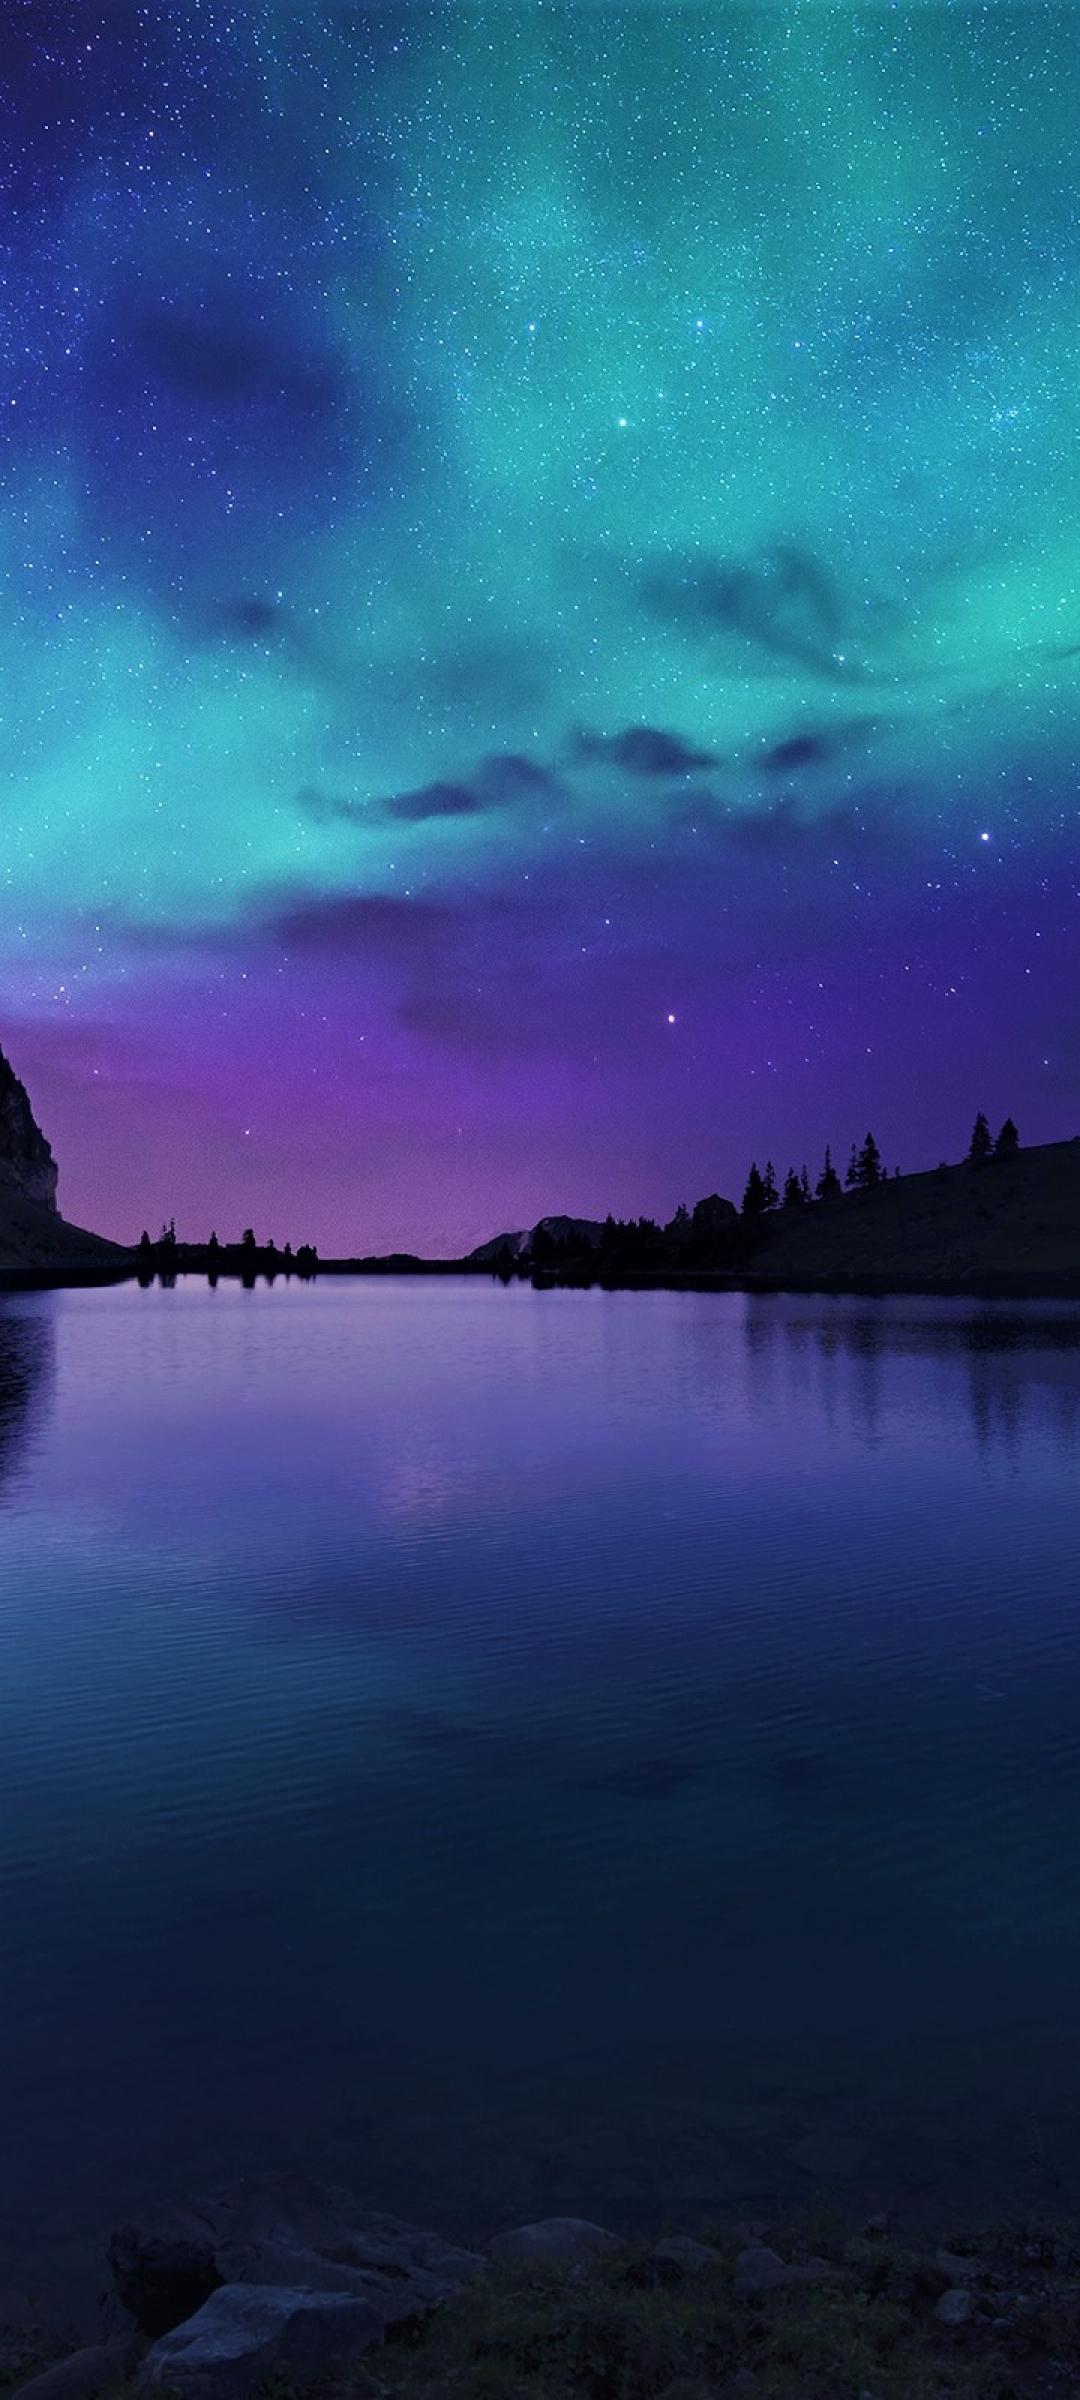 1080x2400 Aurora Borealis Northern Lights Over Mountain ...